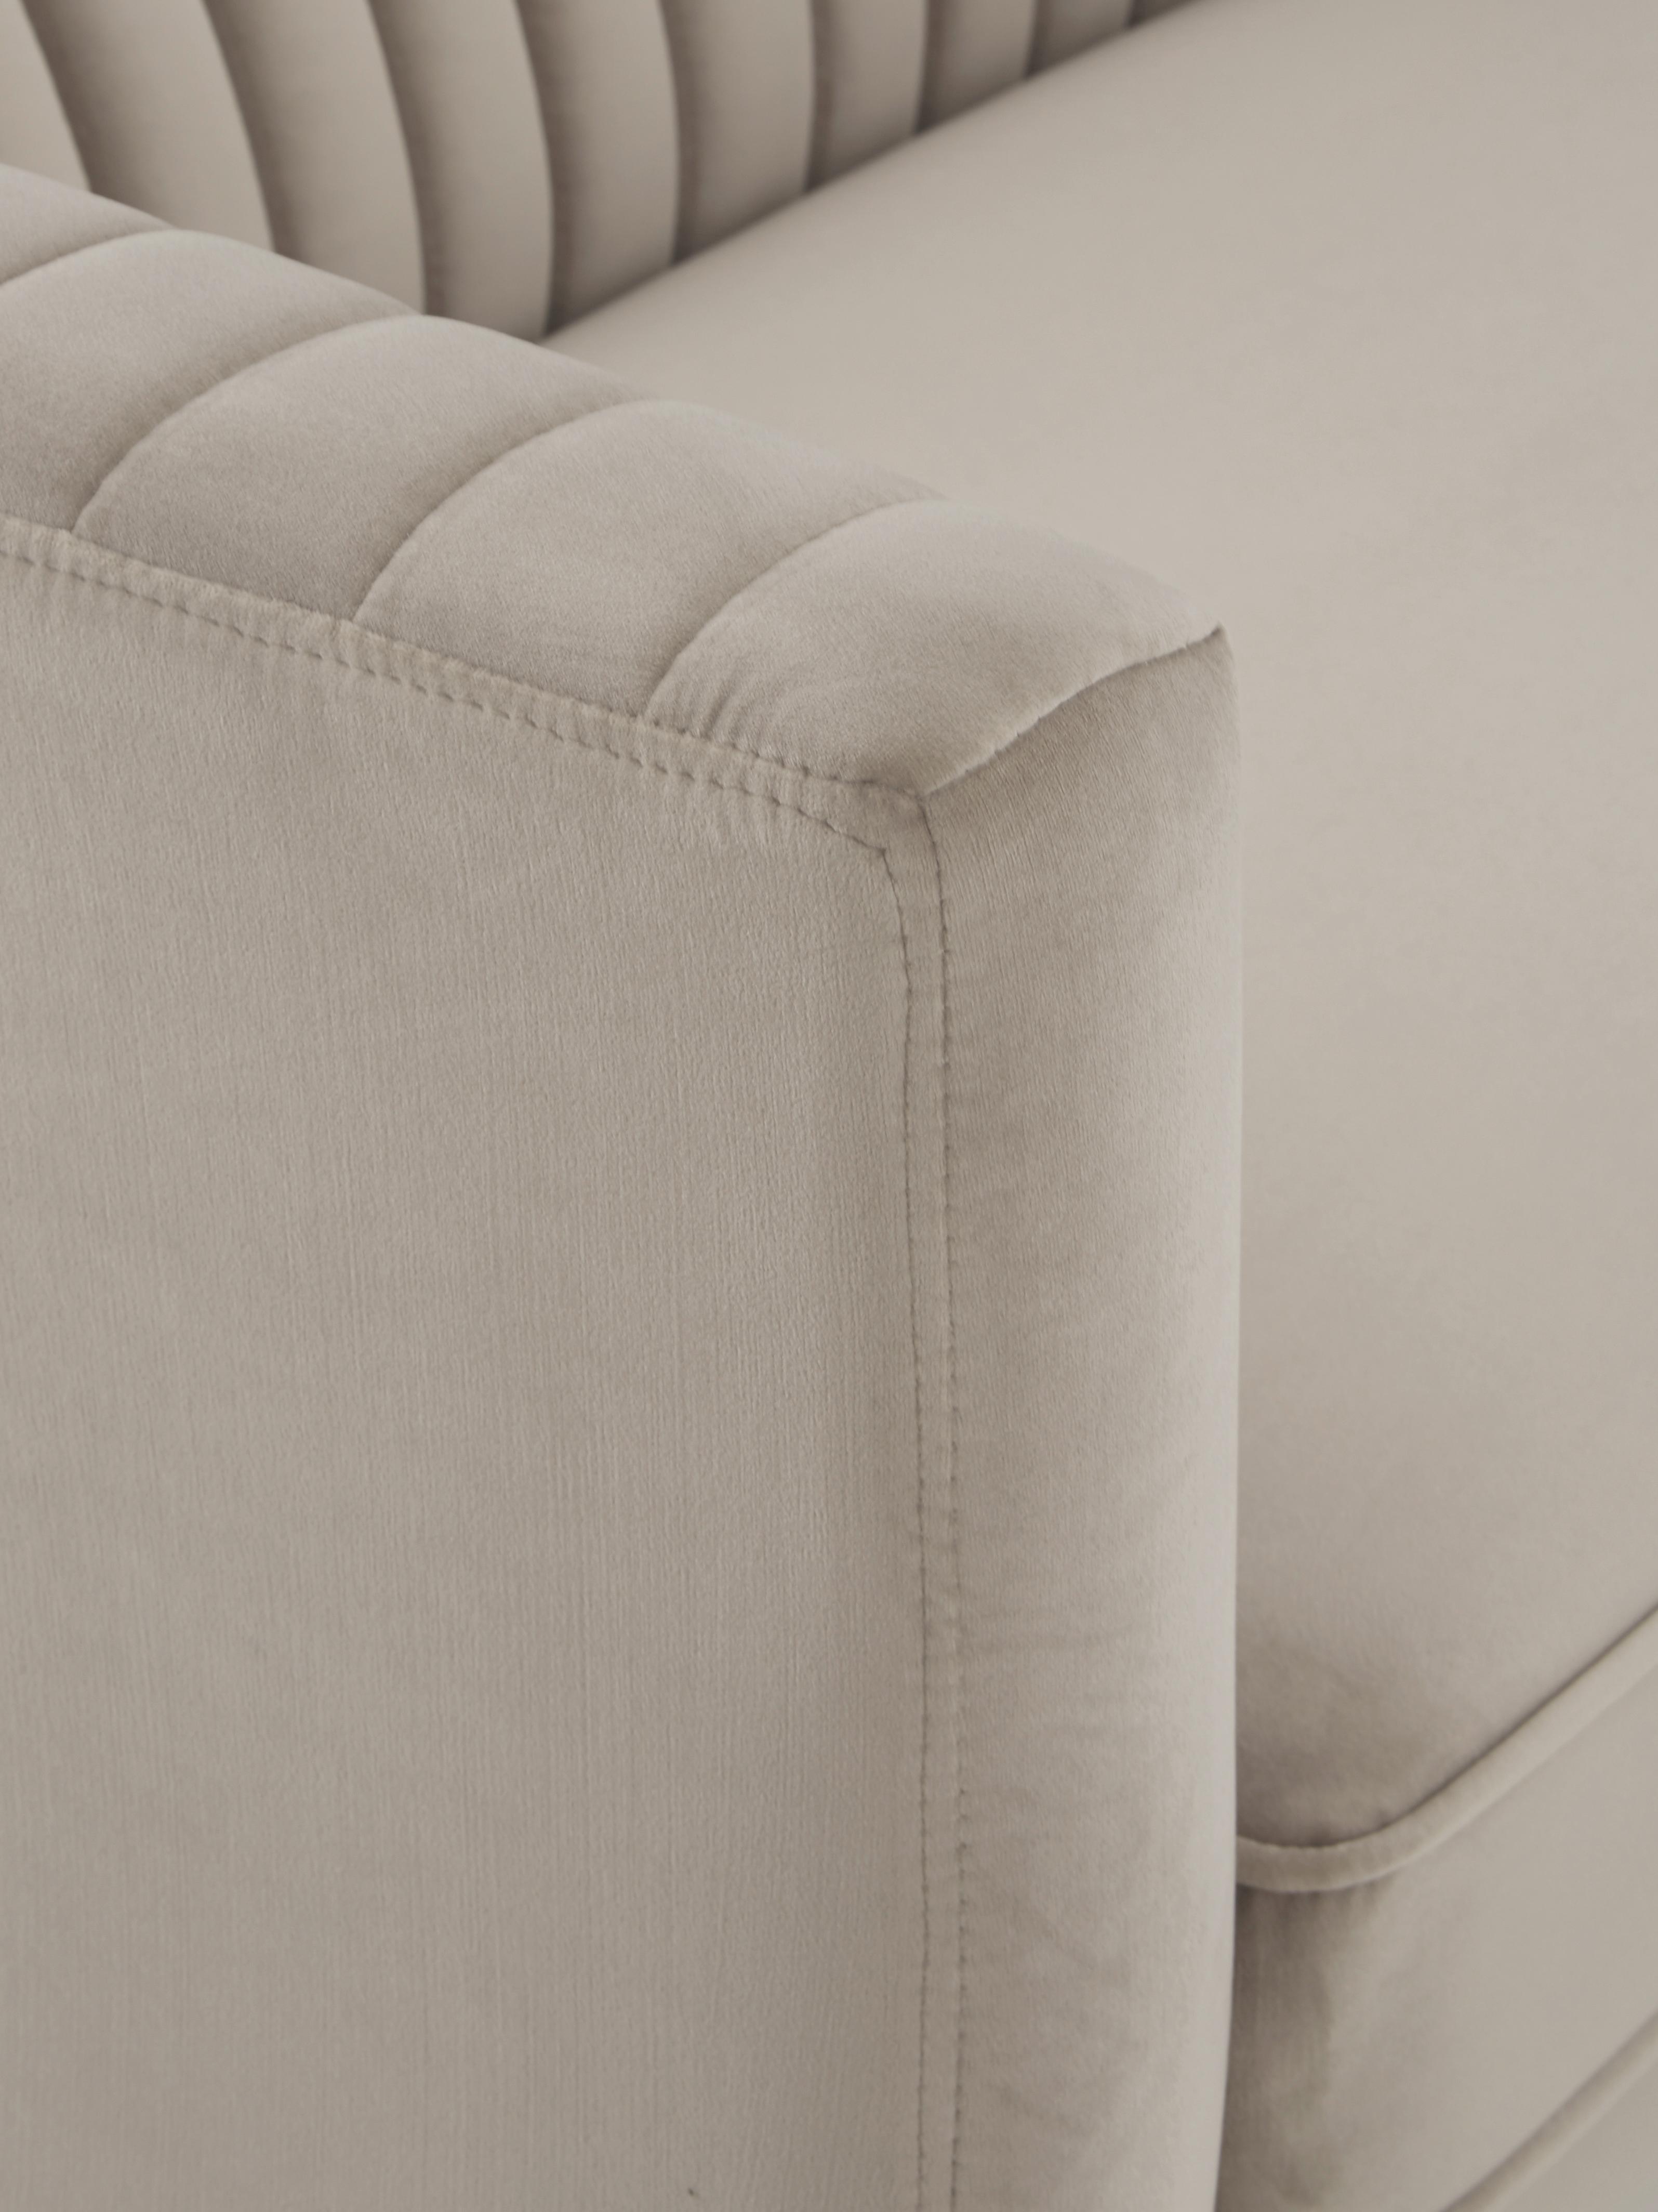 Samt-Sofa Dante (2-Sitzer), Bezug: Polyestersamt, Gestell: Kautschukbaumholz, klarla, Webstoff Beige, B 174 x T 87 cm